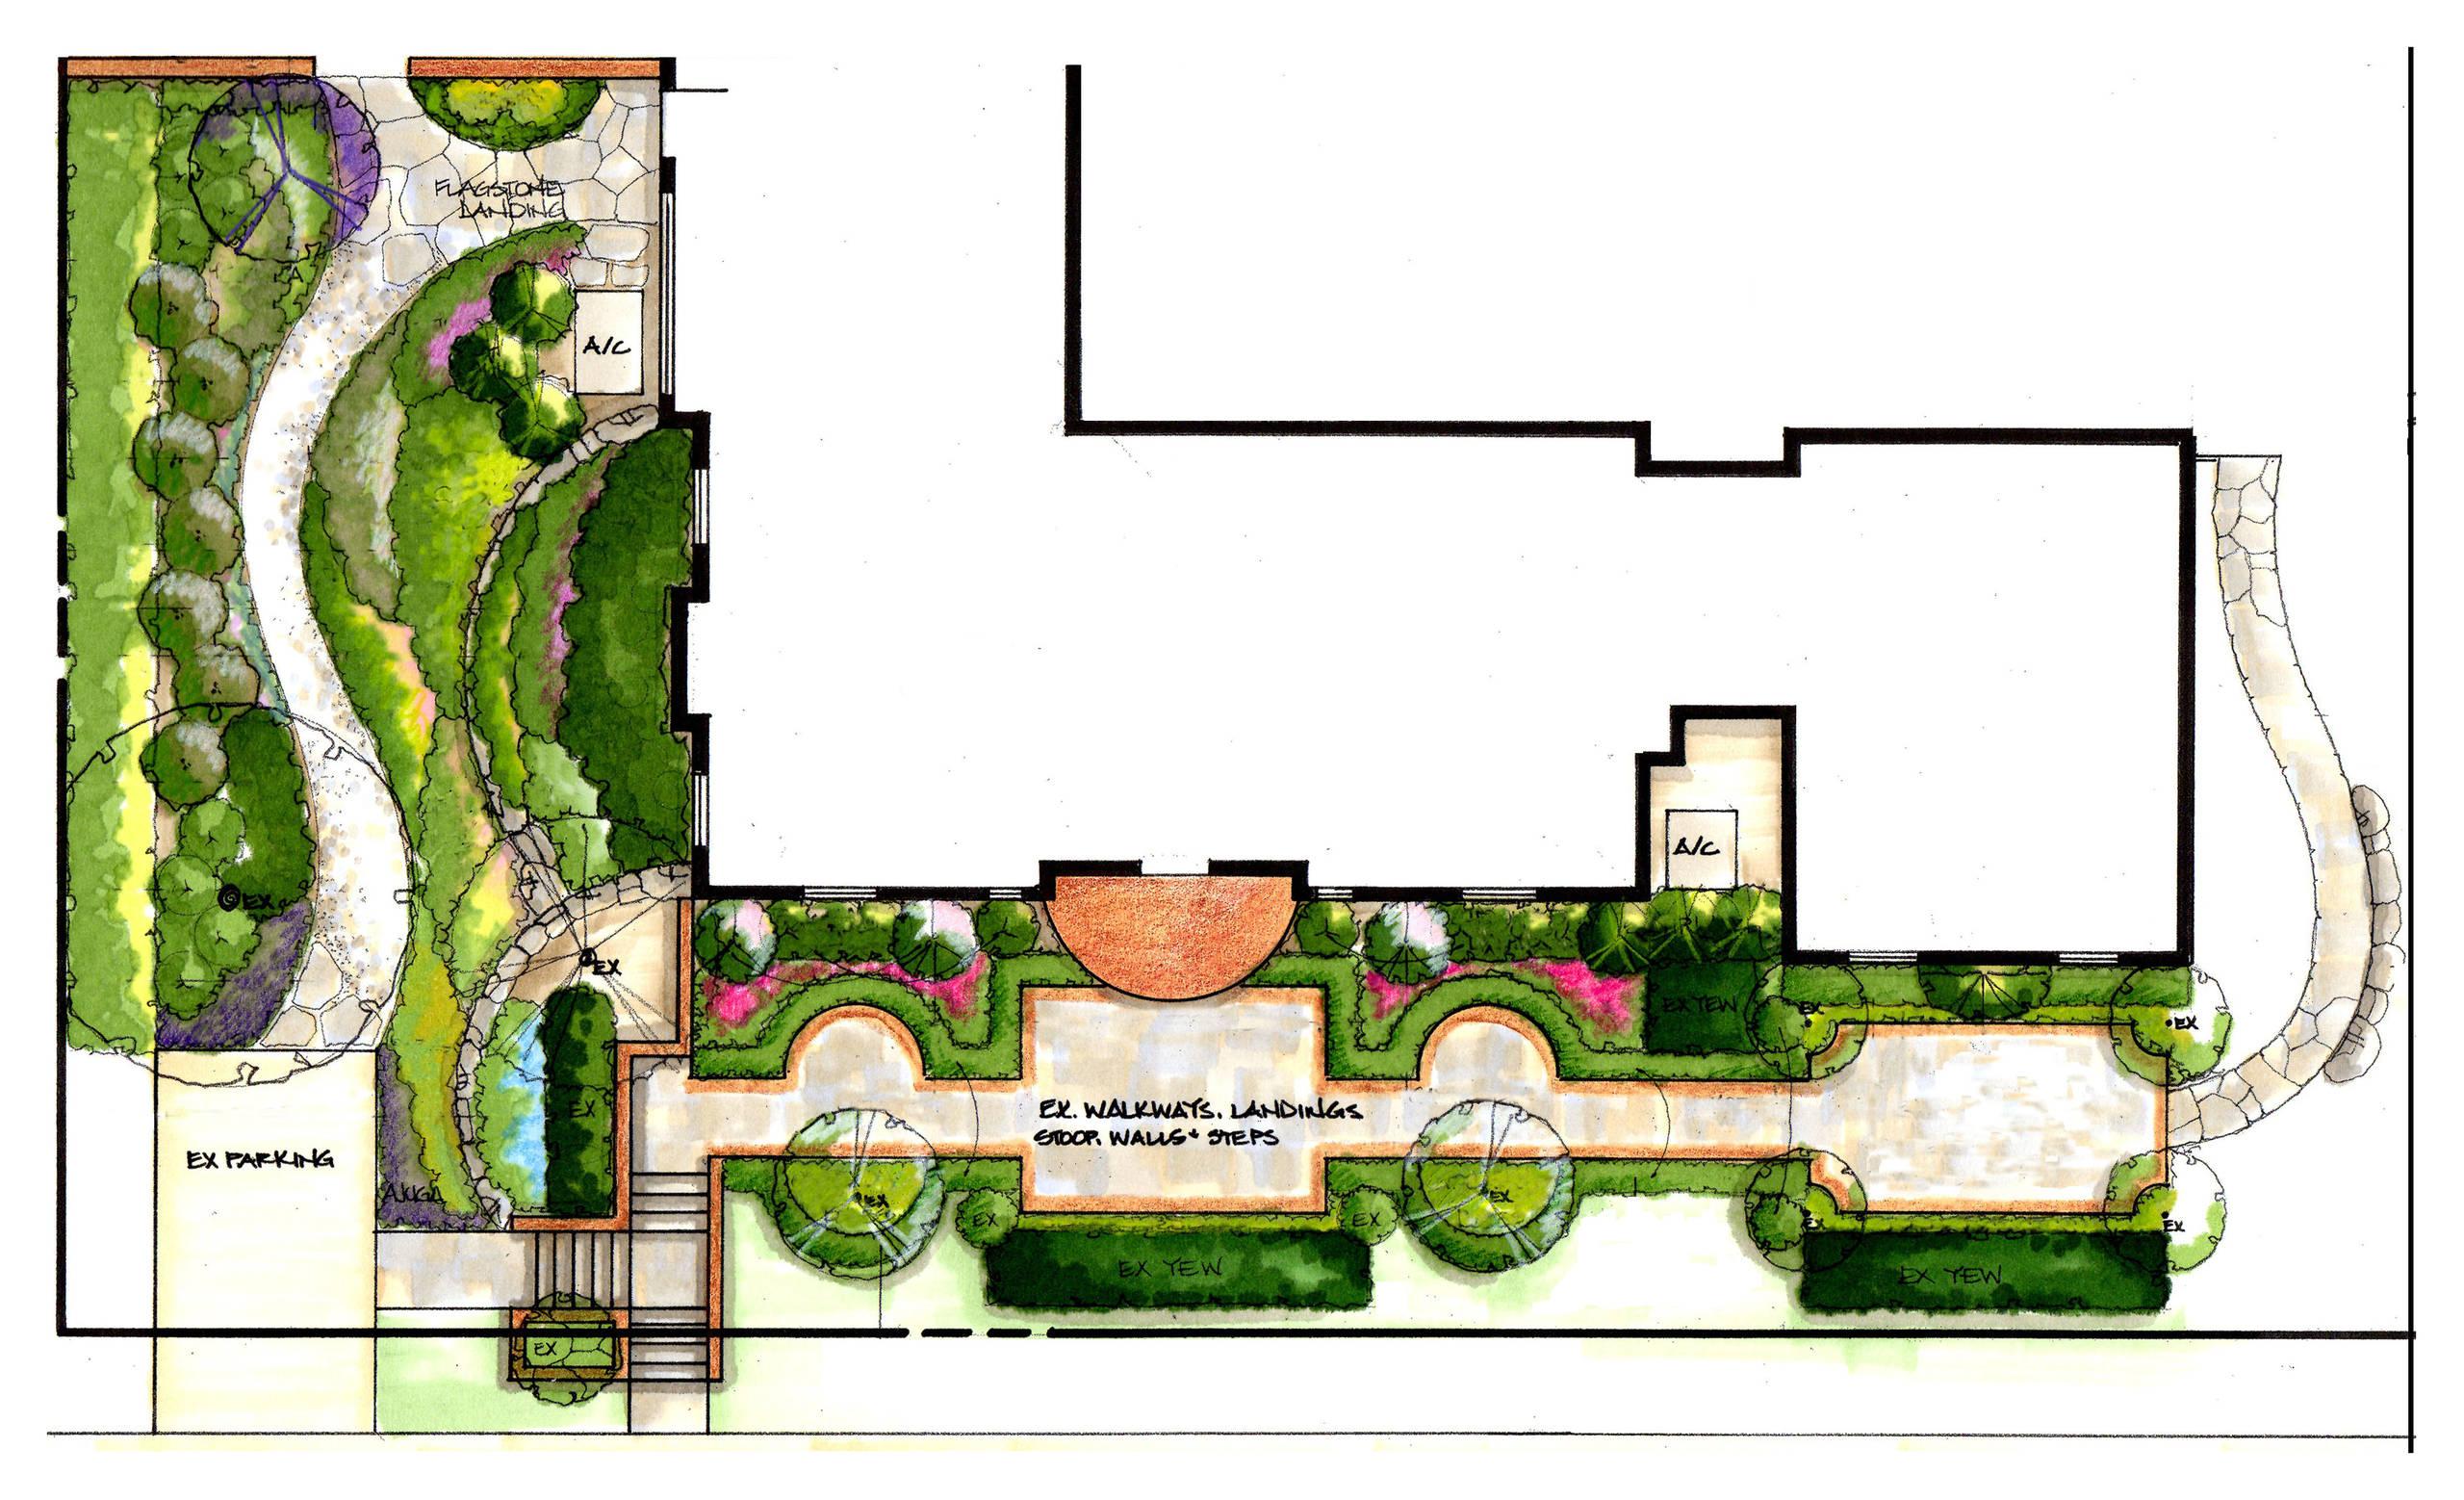 Formal and Informal Garden Plan